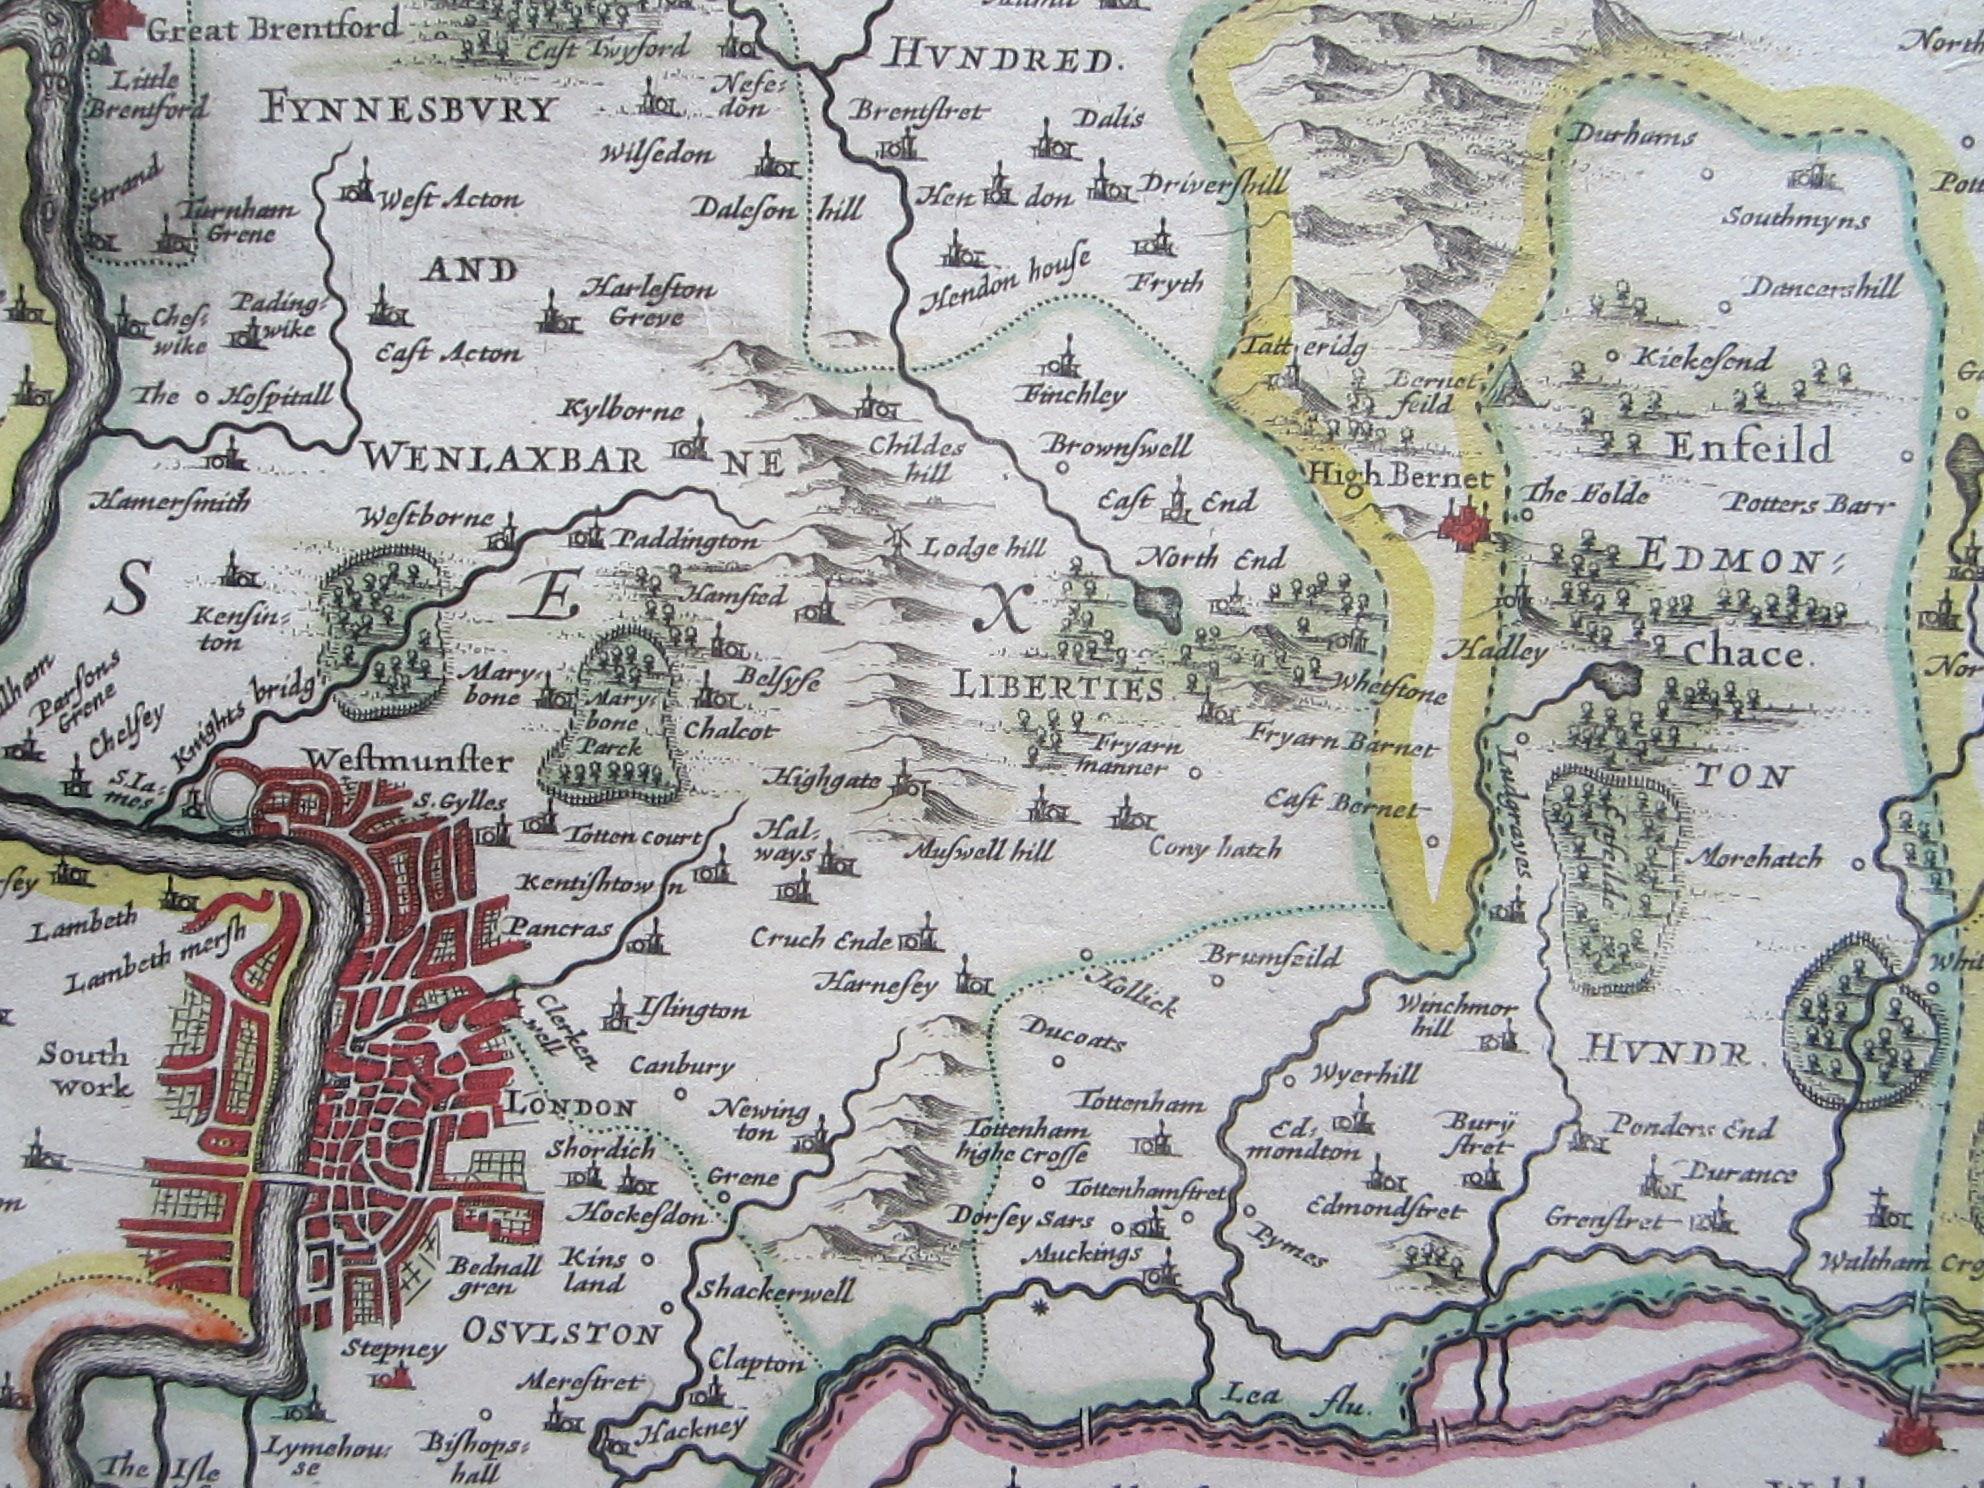 Middelsexiae cum Hertfordiae comitatu: Midlesex & Hertford Shire (photo 5)